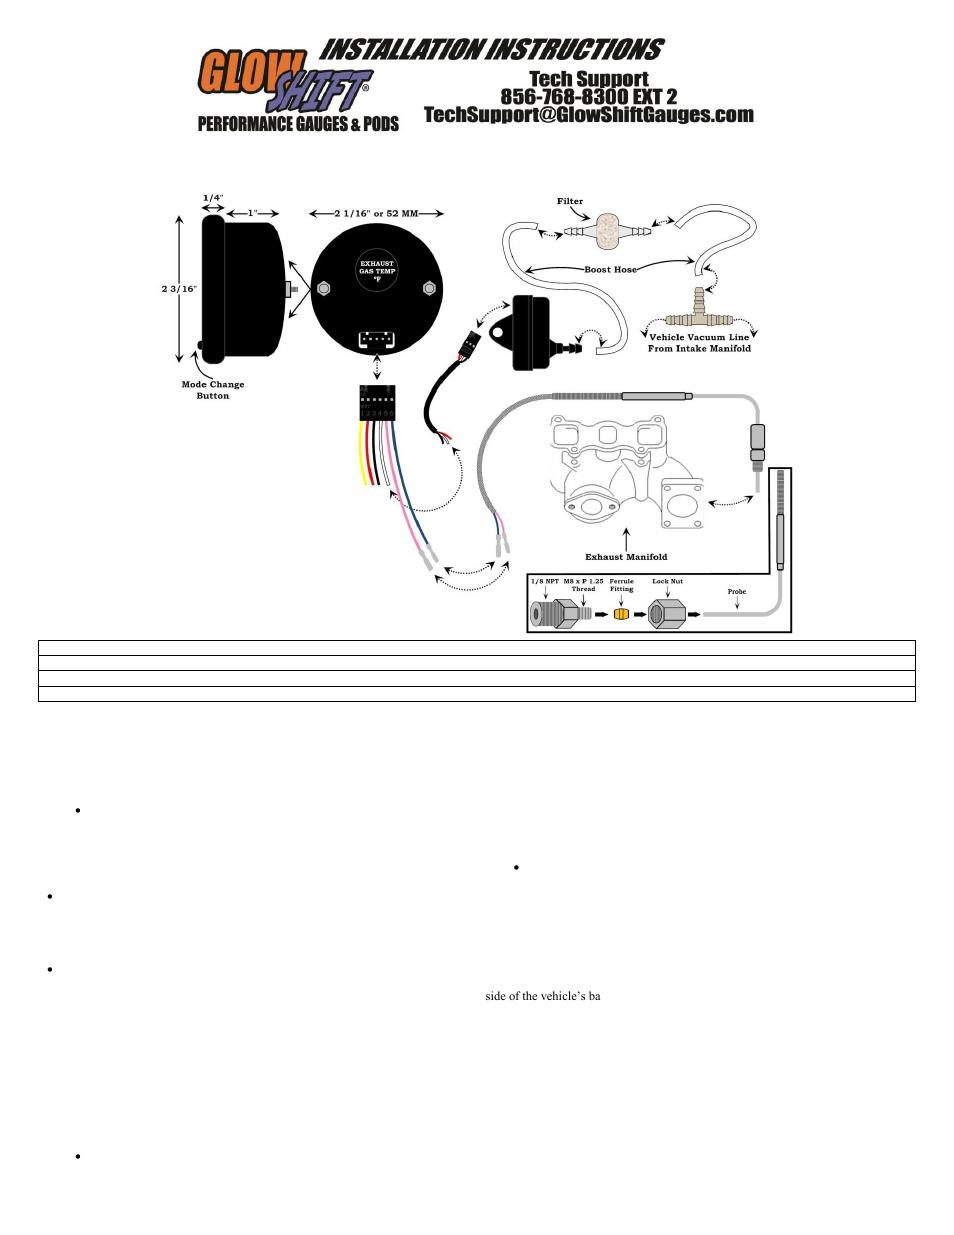 Wrx Glowshift Wiring Diagram